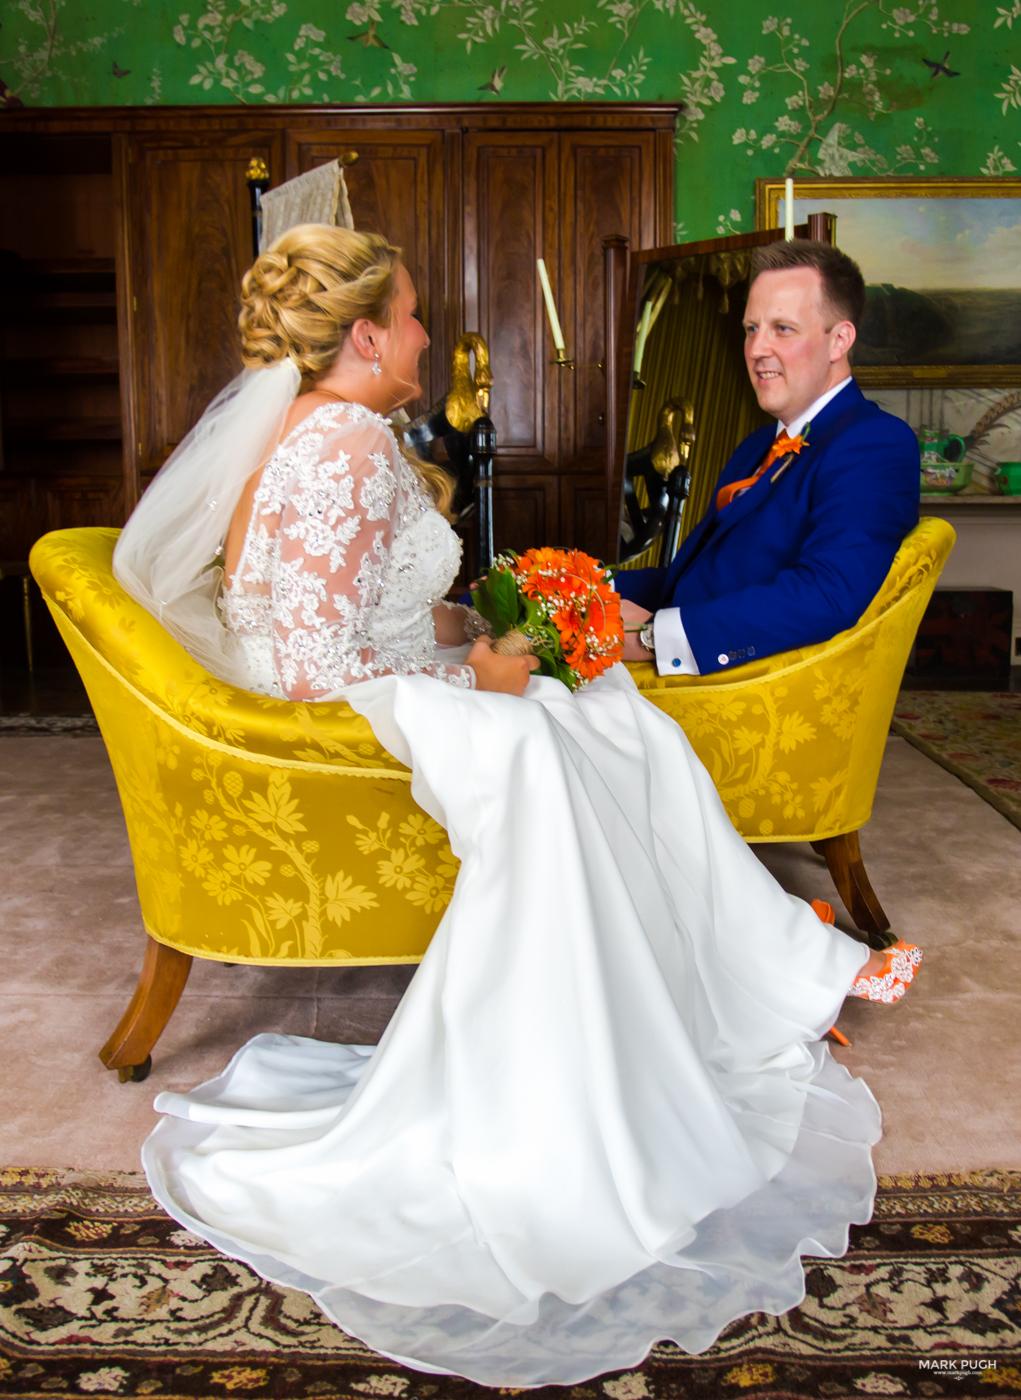 174 Wedding Photography Award winning Wedding Photographer and Videographer Mark Pugh www.markpugh.com.JPG